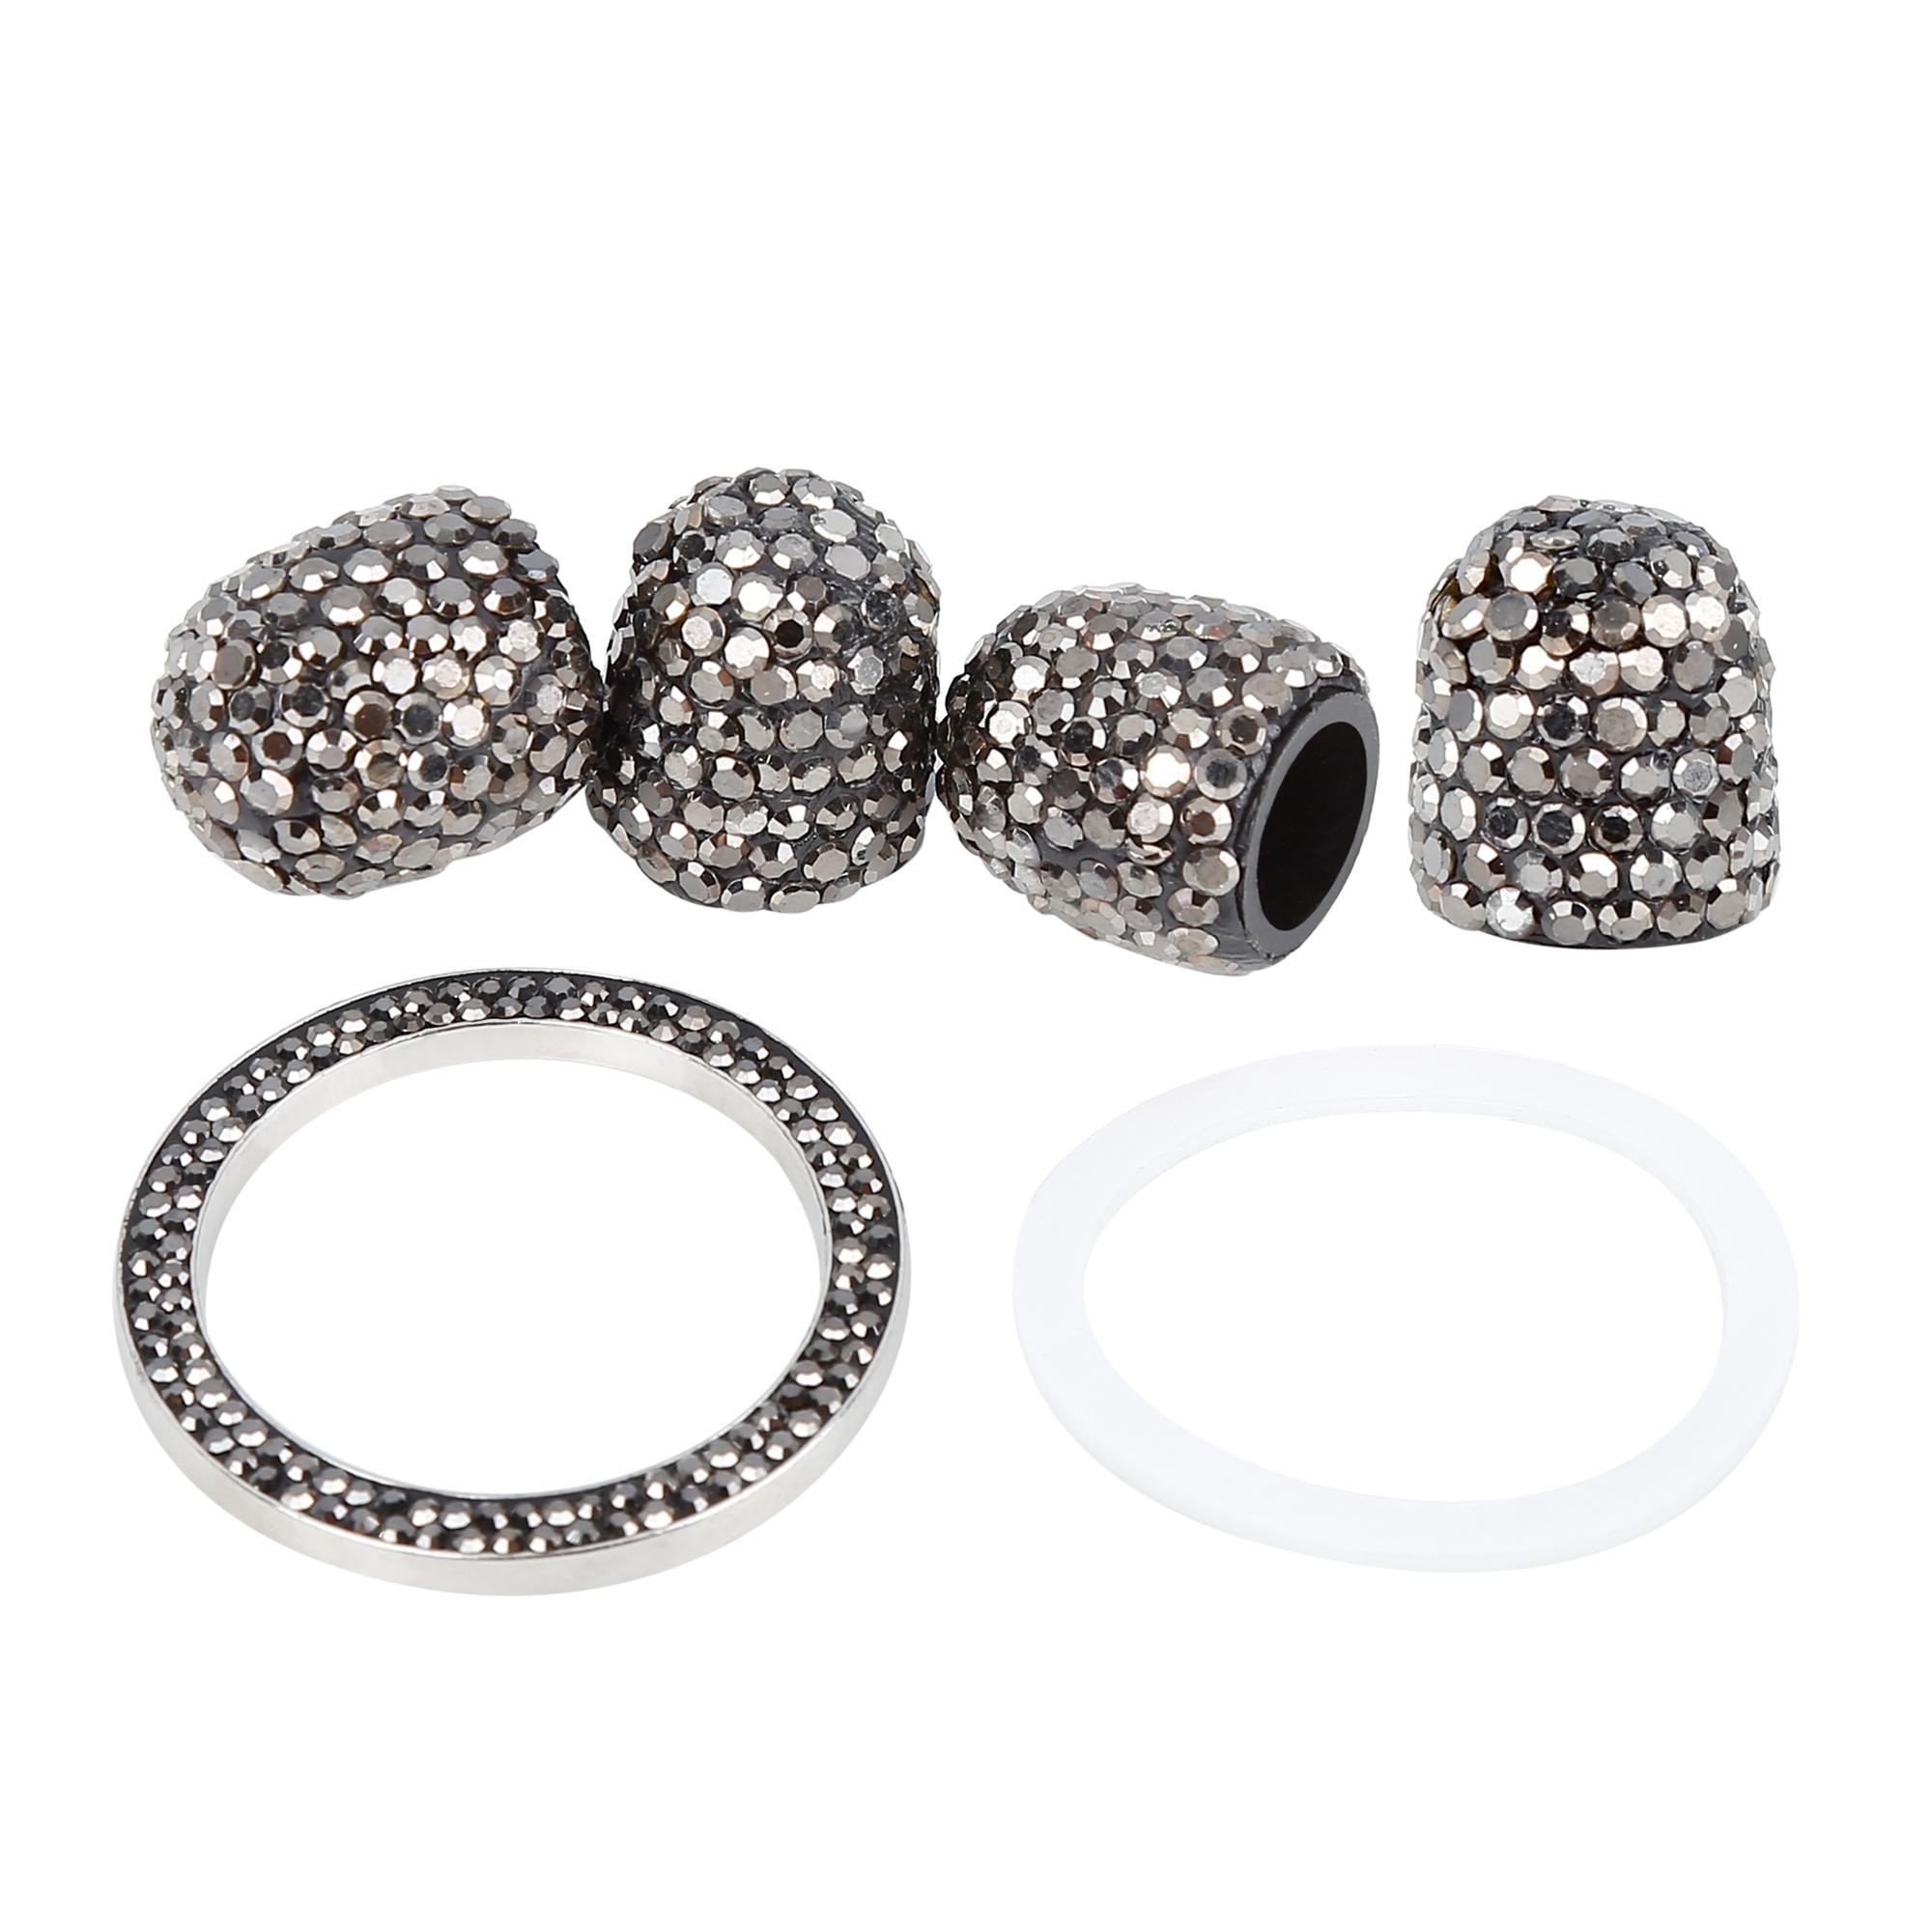 4PCS Bling Tire Valve Stem Tyre Air Caps Cover + Ring Emblem Gloss Black